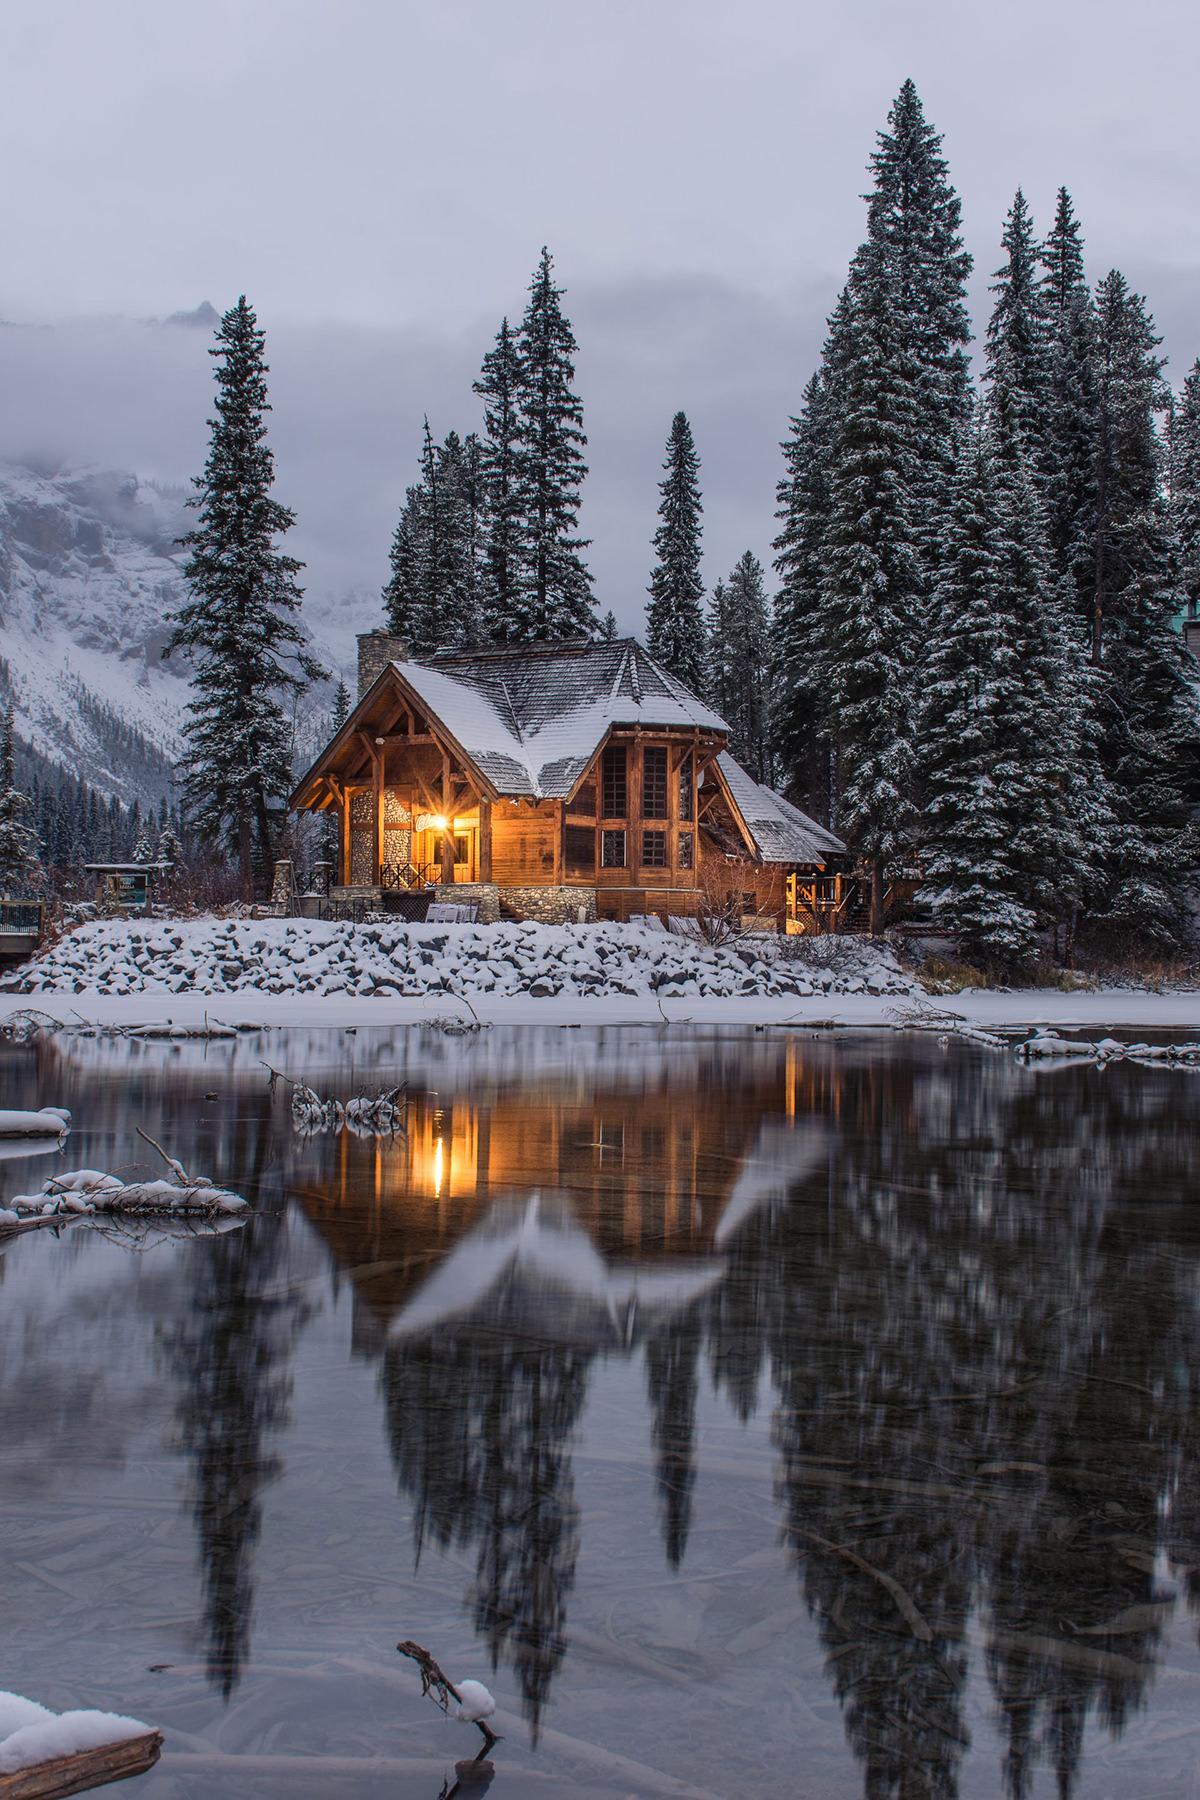 Wordspill in Winter